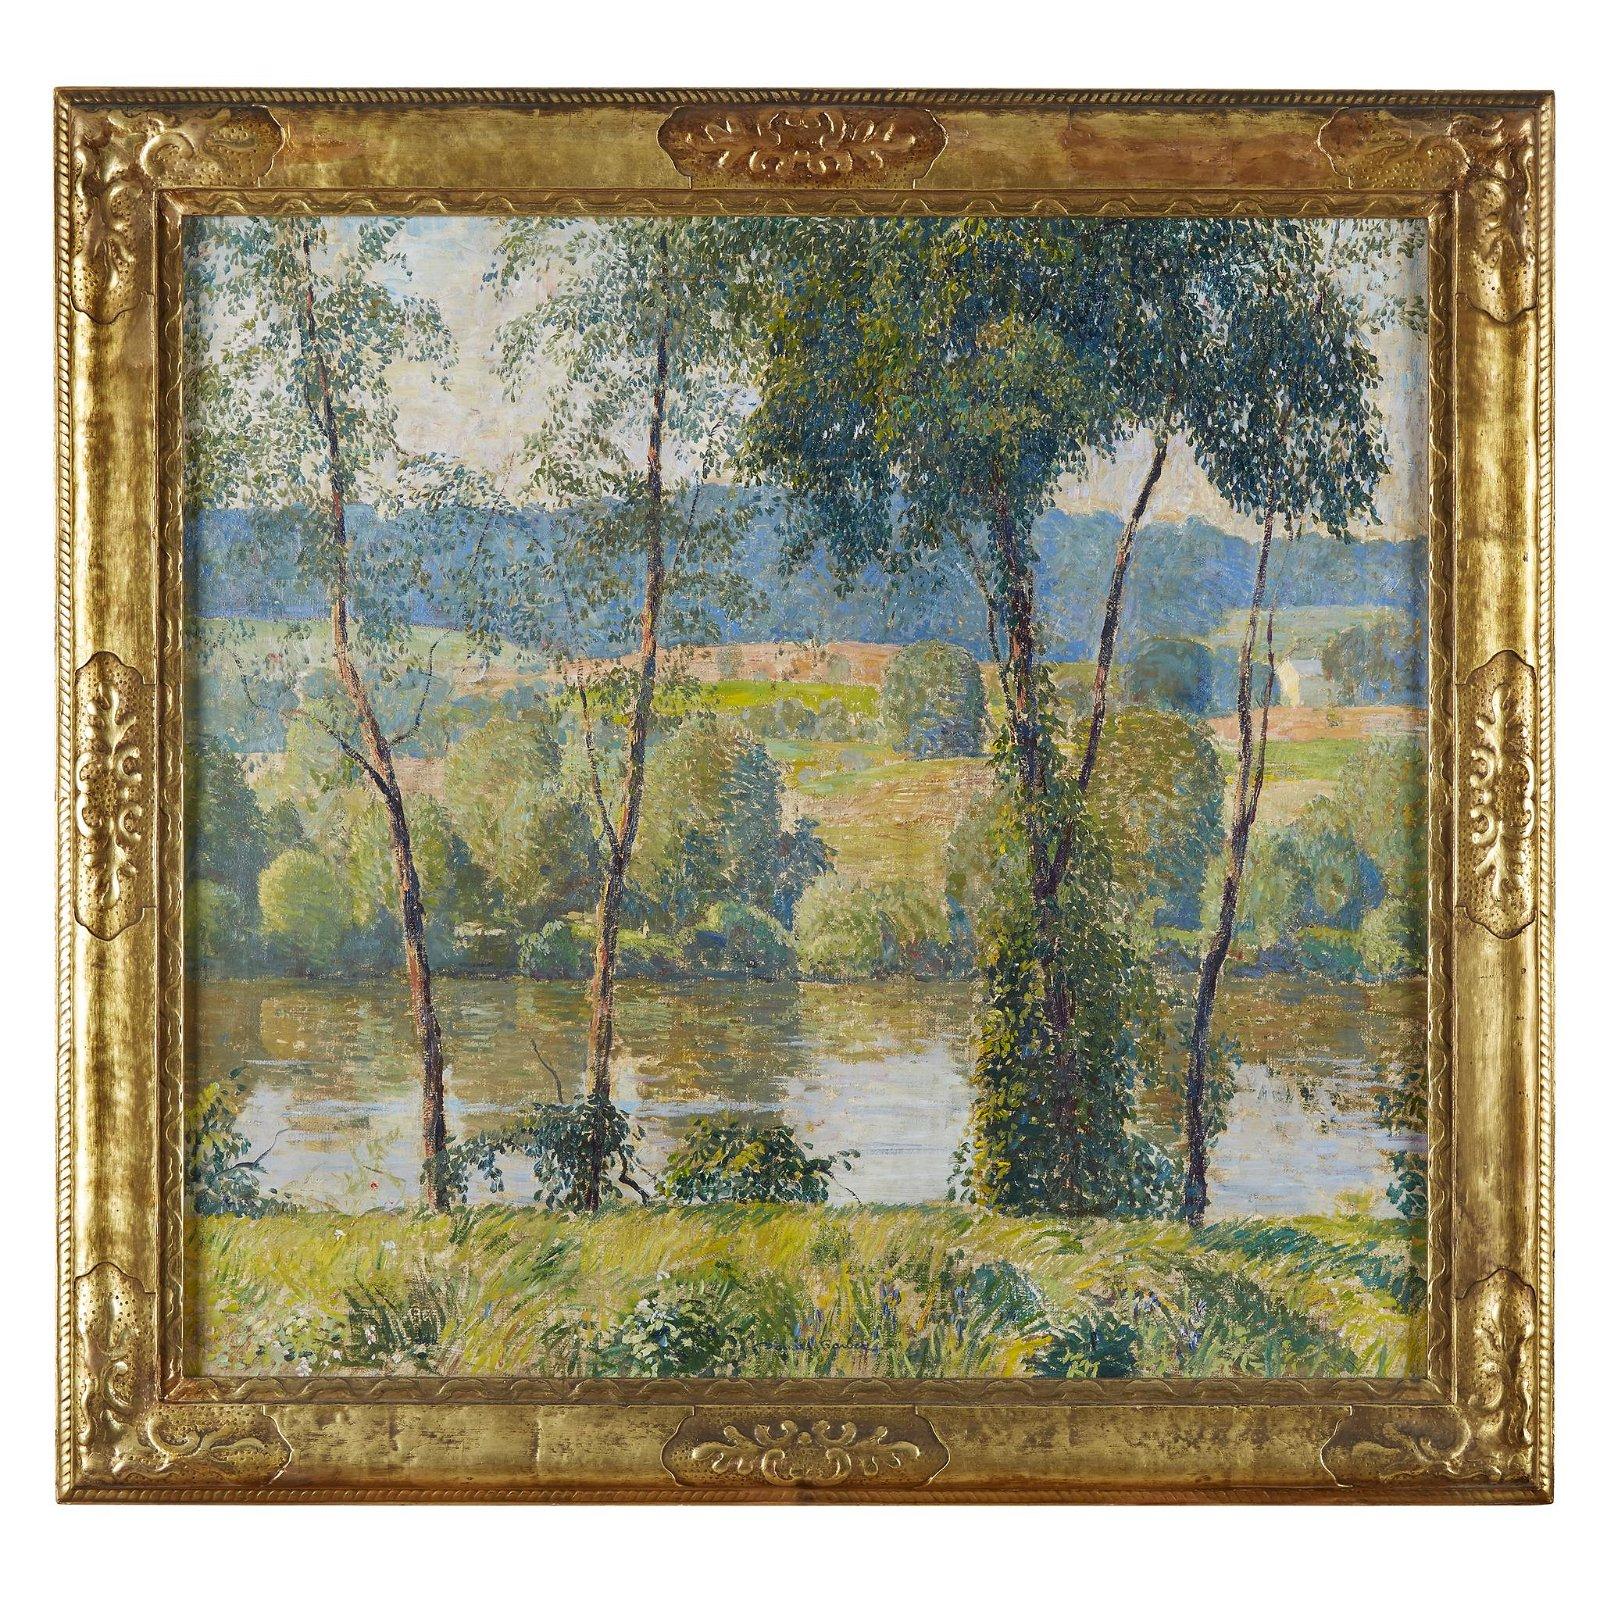 Daniel Garber (American, 1880–1958), , By the River